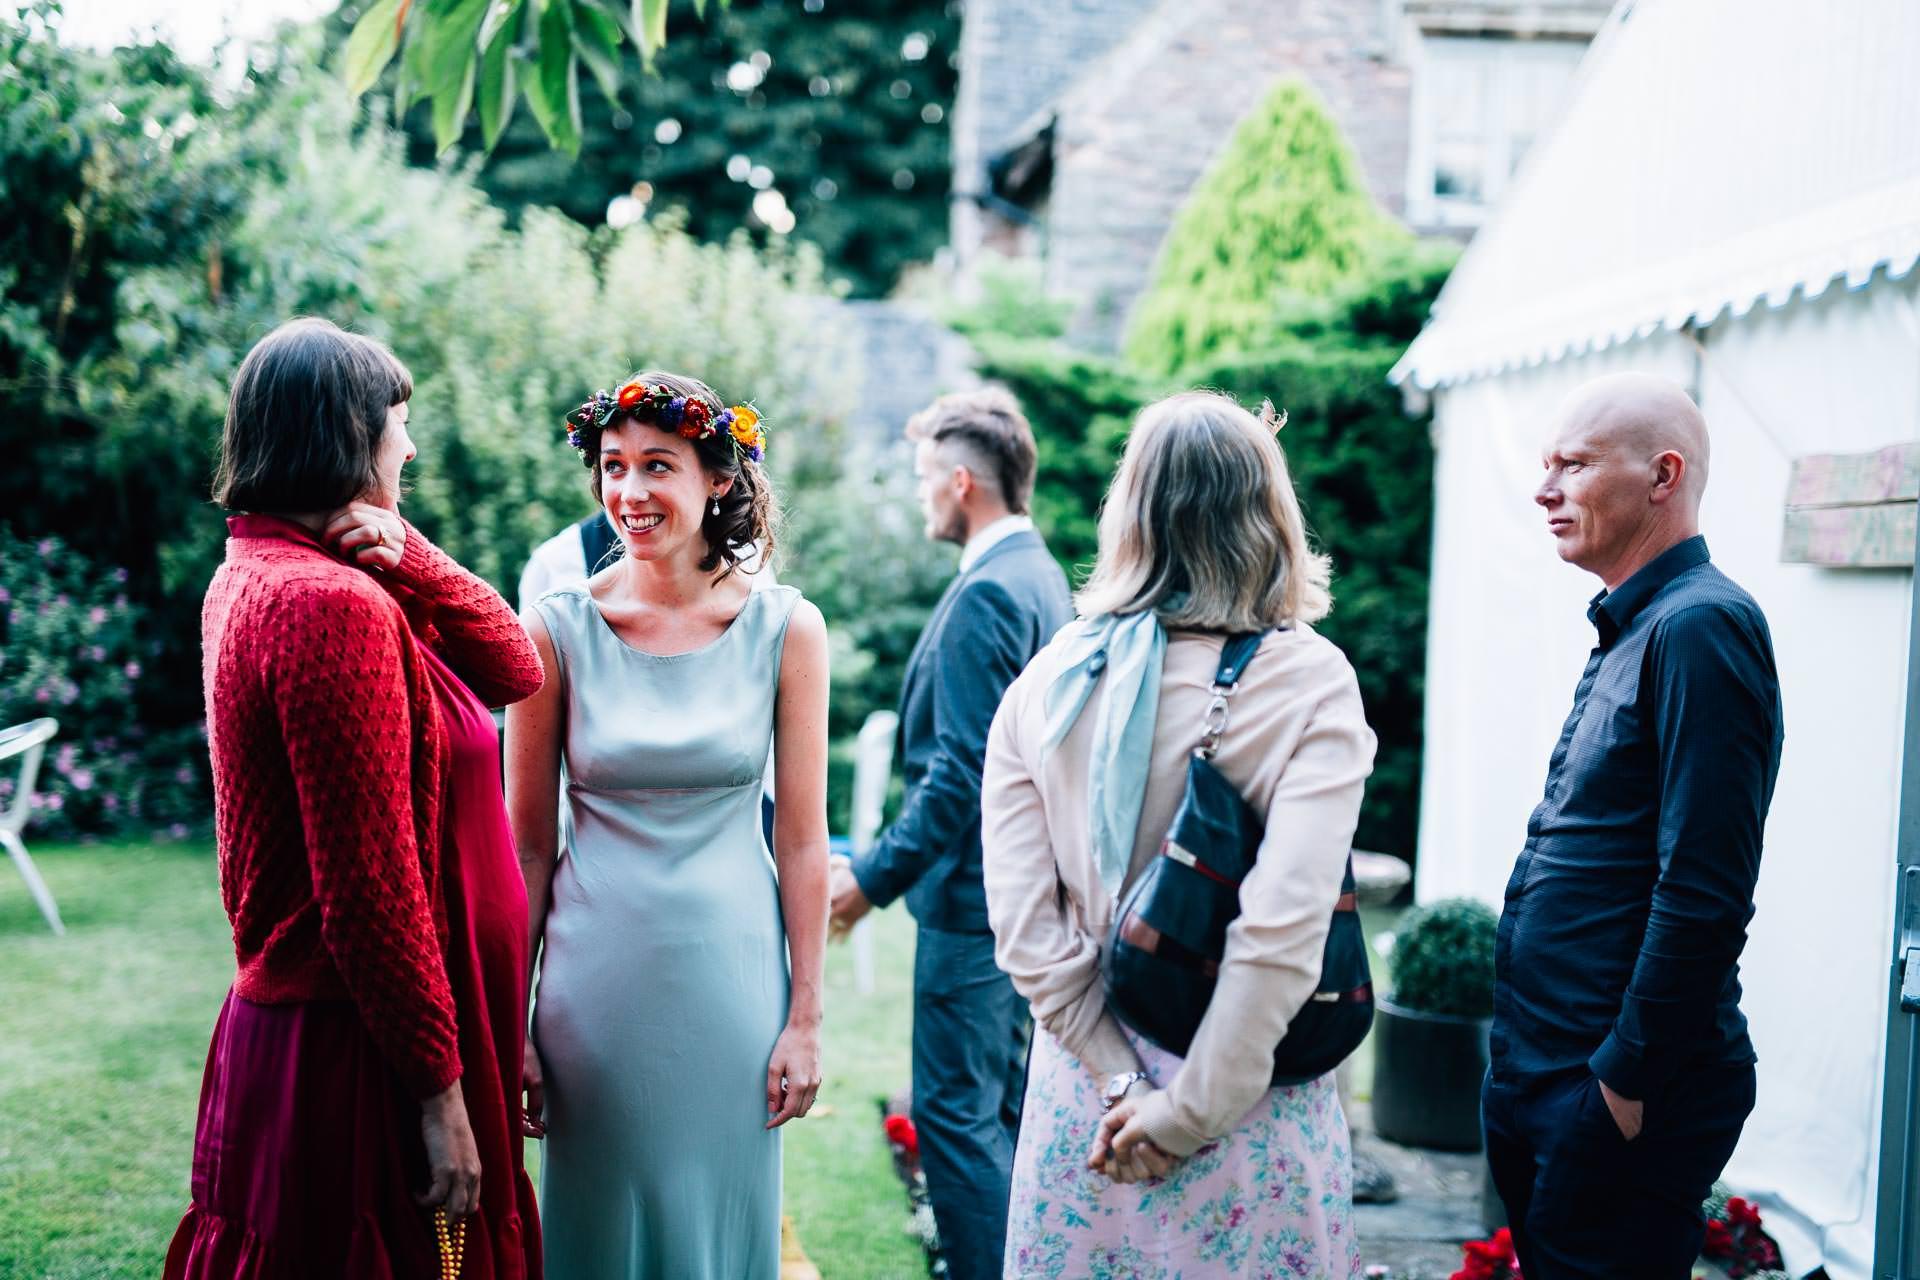 winterbourne-medieval-barn-wedding-photography-emma-andrew-107